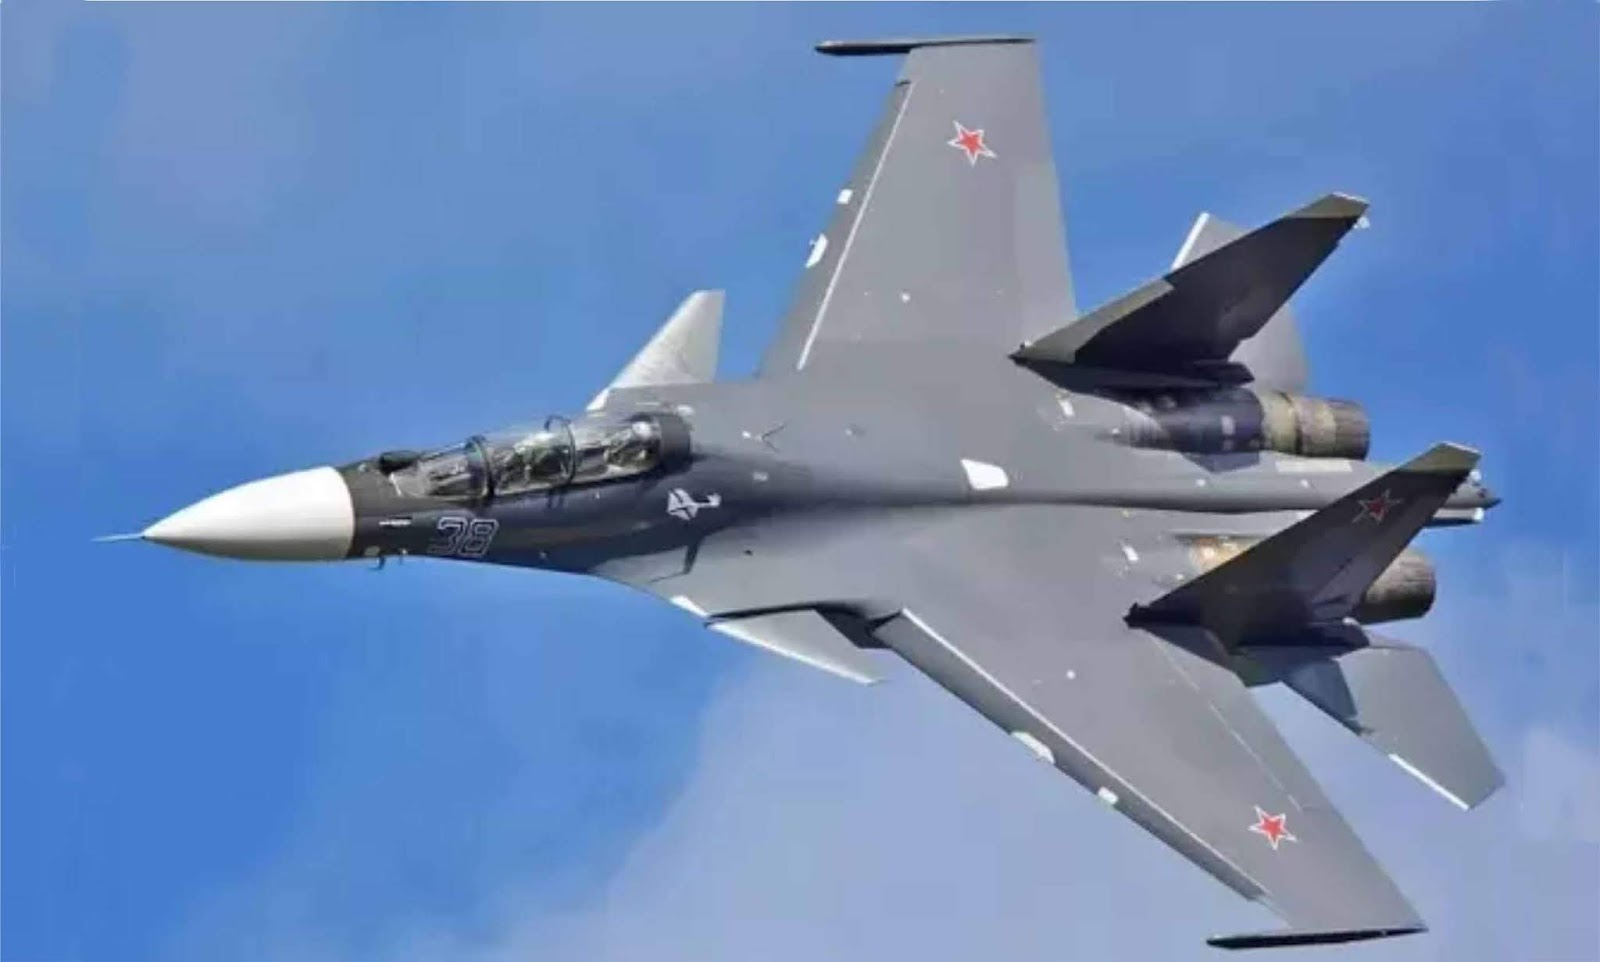 Tindak Lanjut Pengadaan SU-35 dan Program Pengembangan KF-X/IF-X